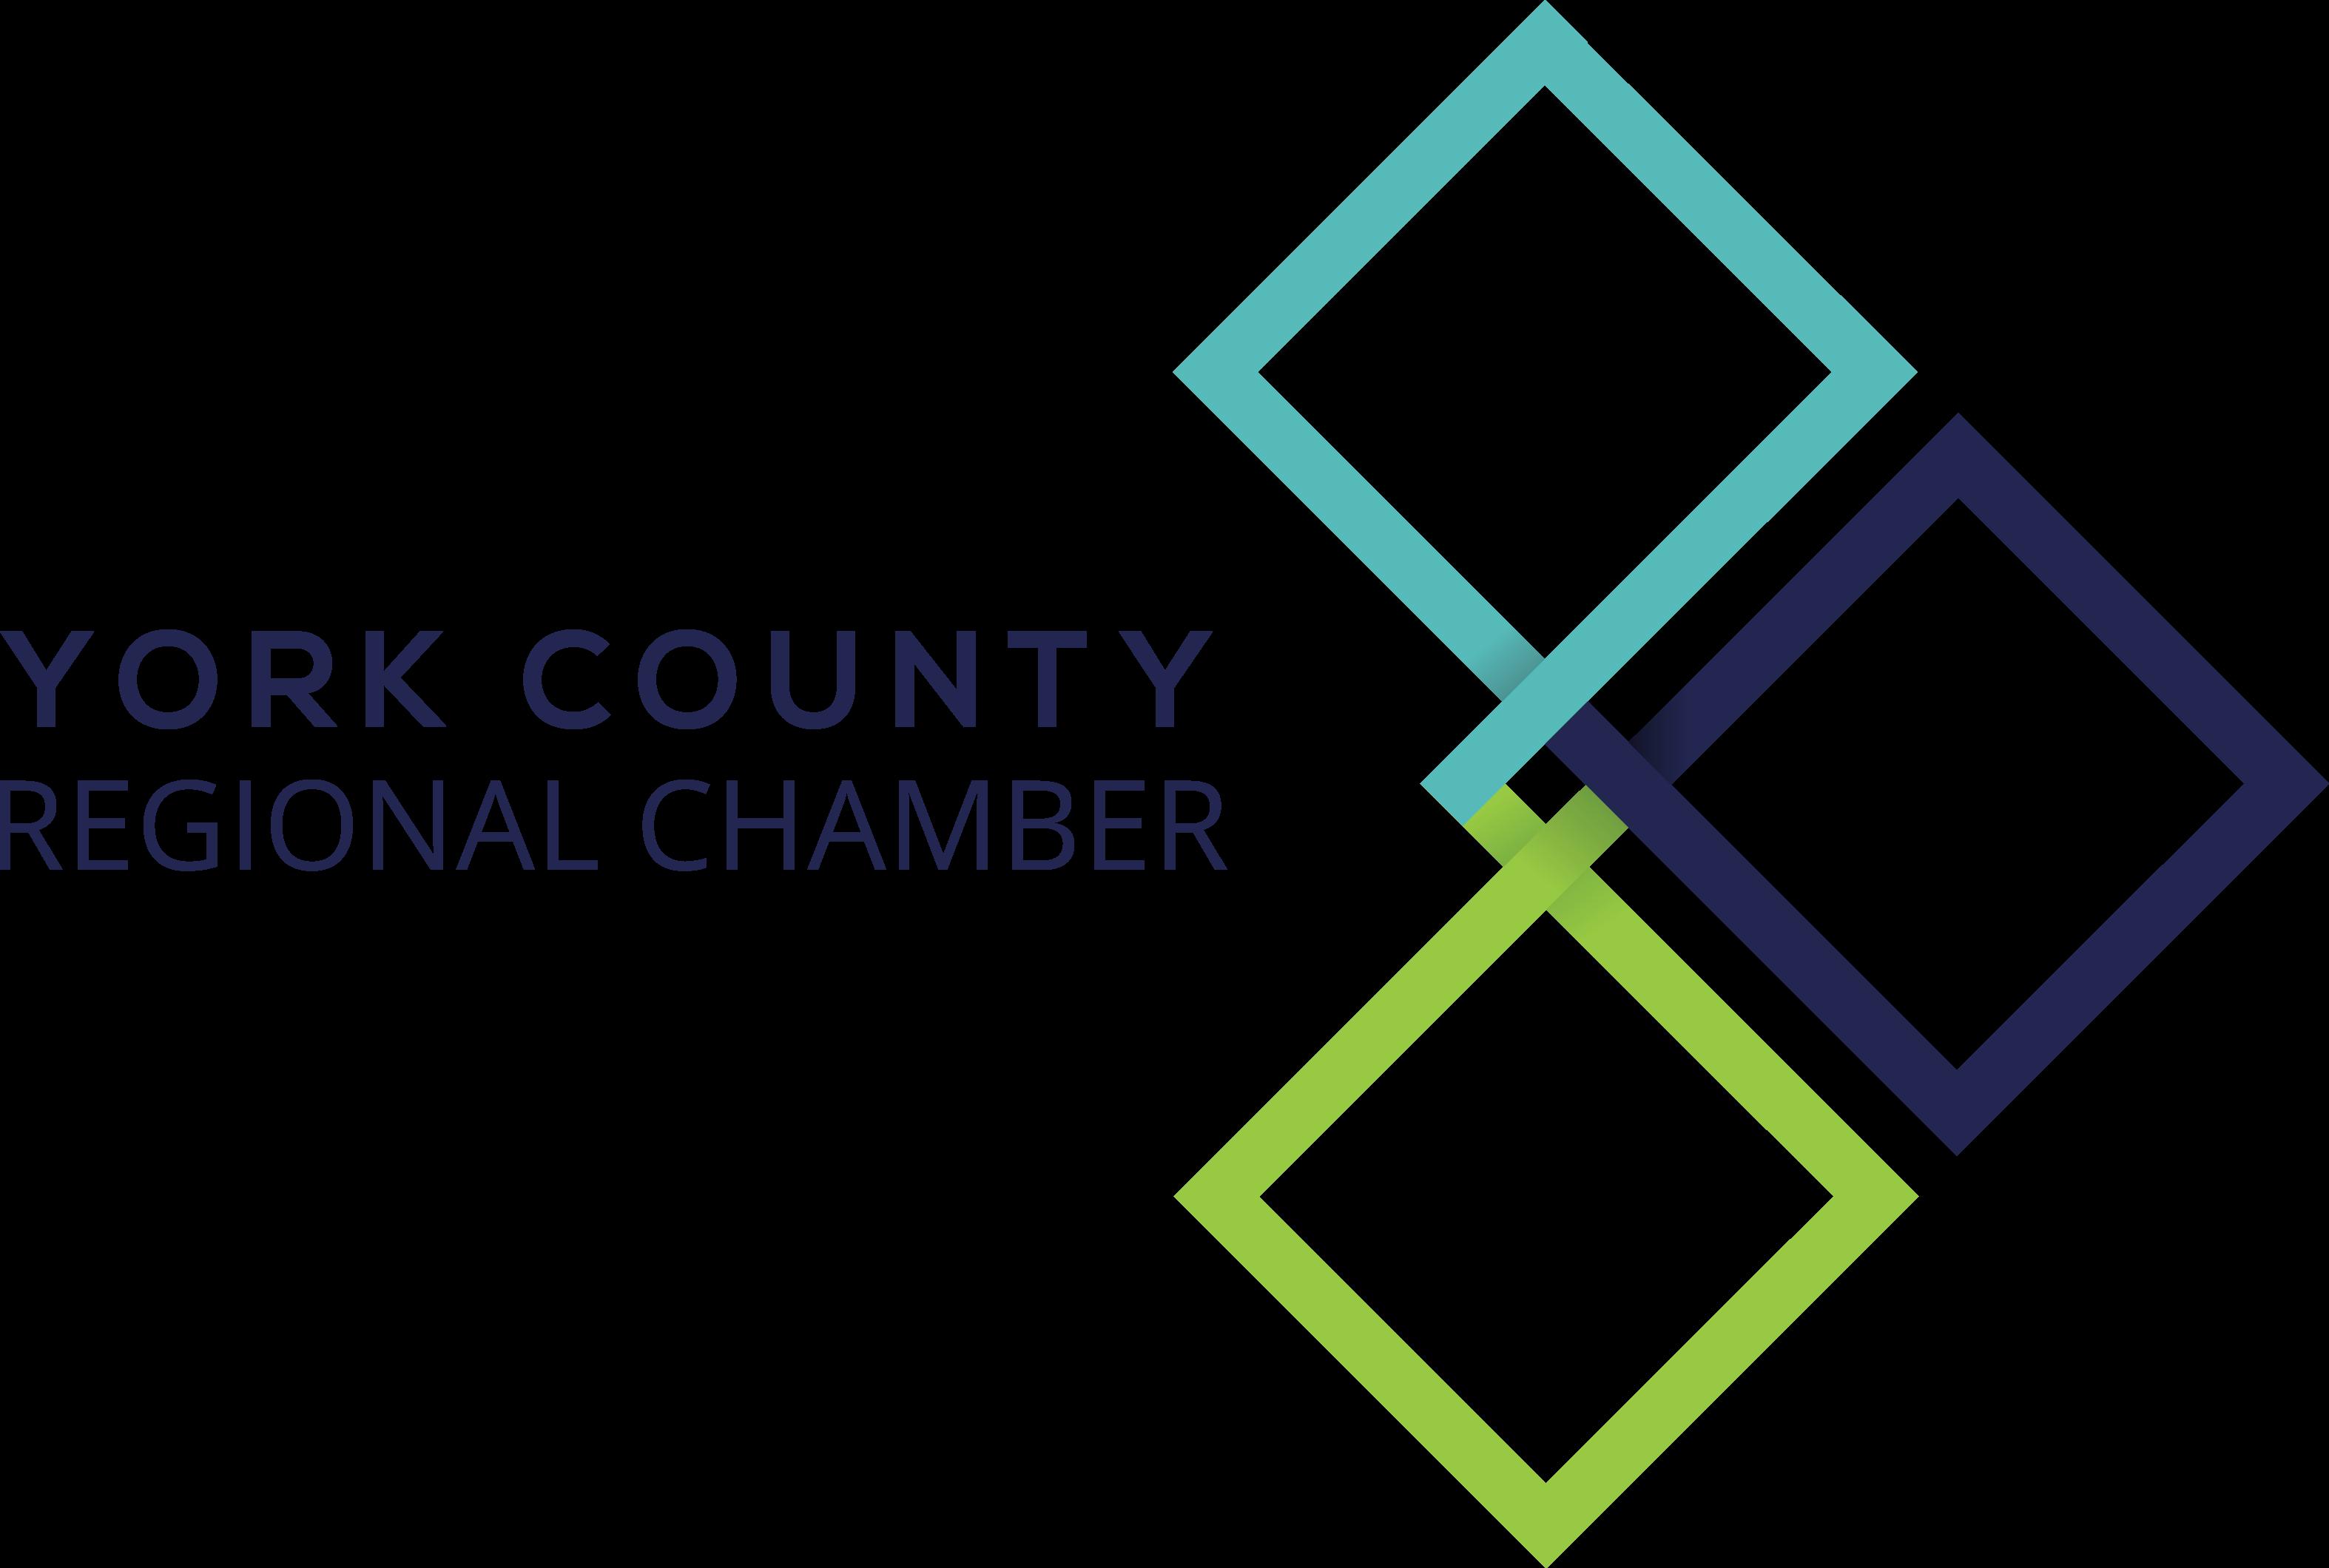 York County Regional Chamber of Commerce